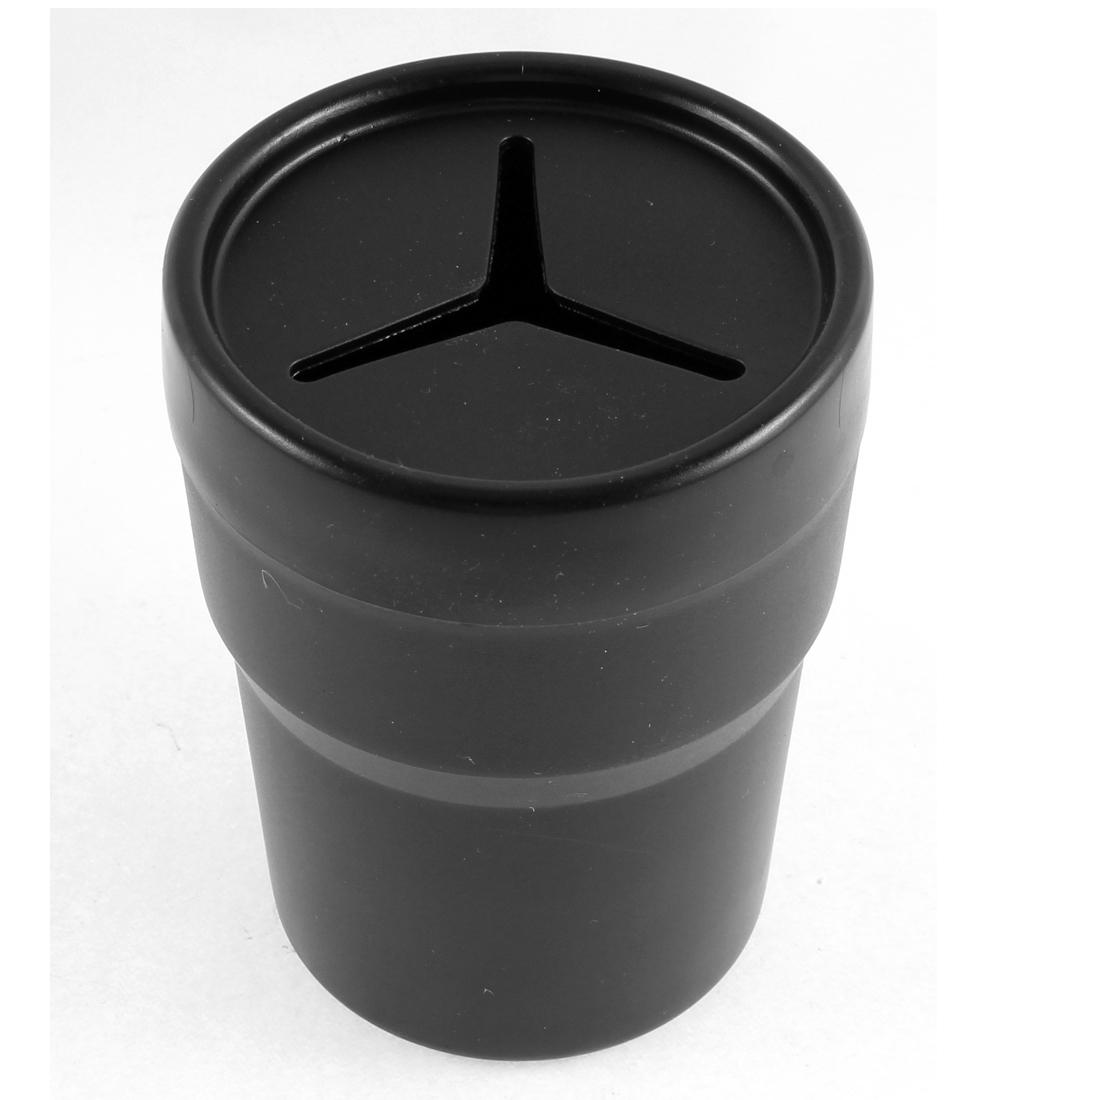 Black Plastic Soft PVC Pen Coin Trash Bin Box Container Storage for Car